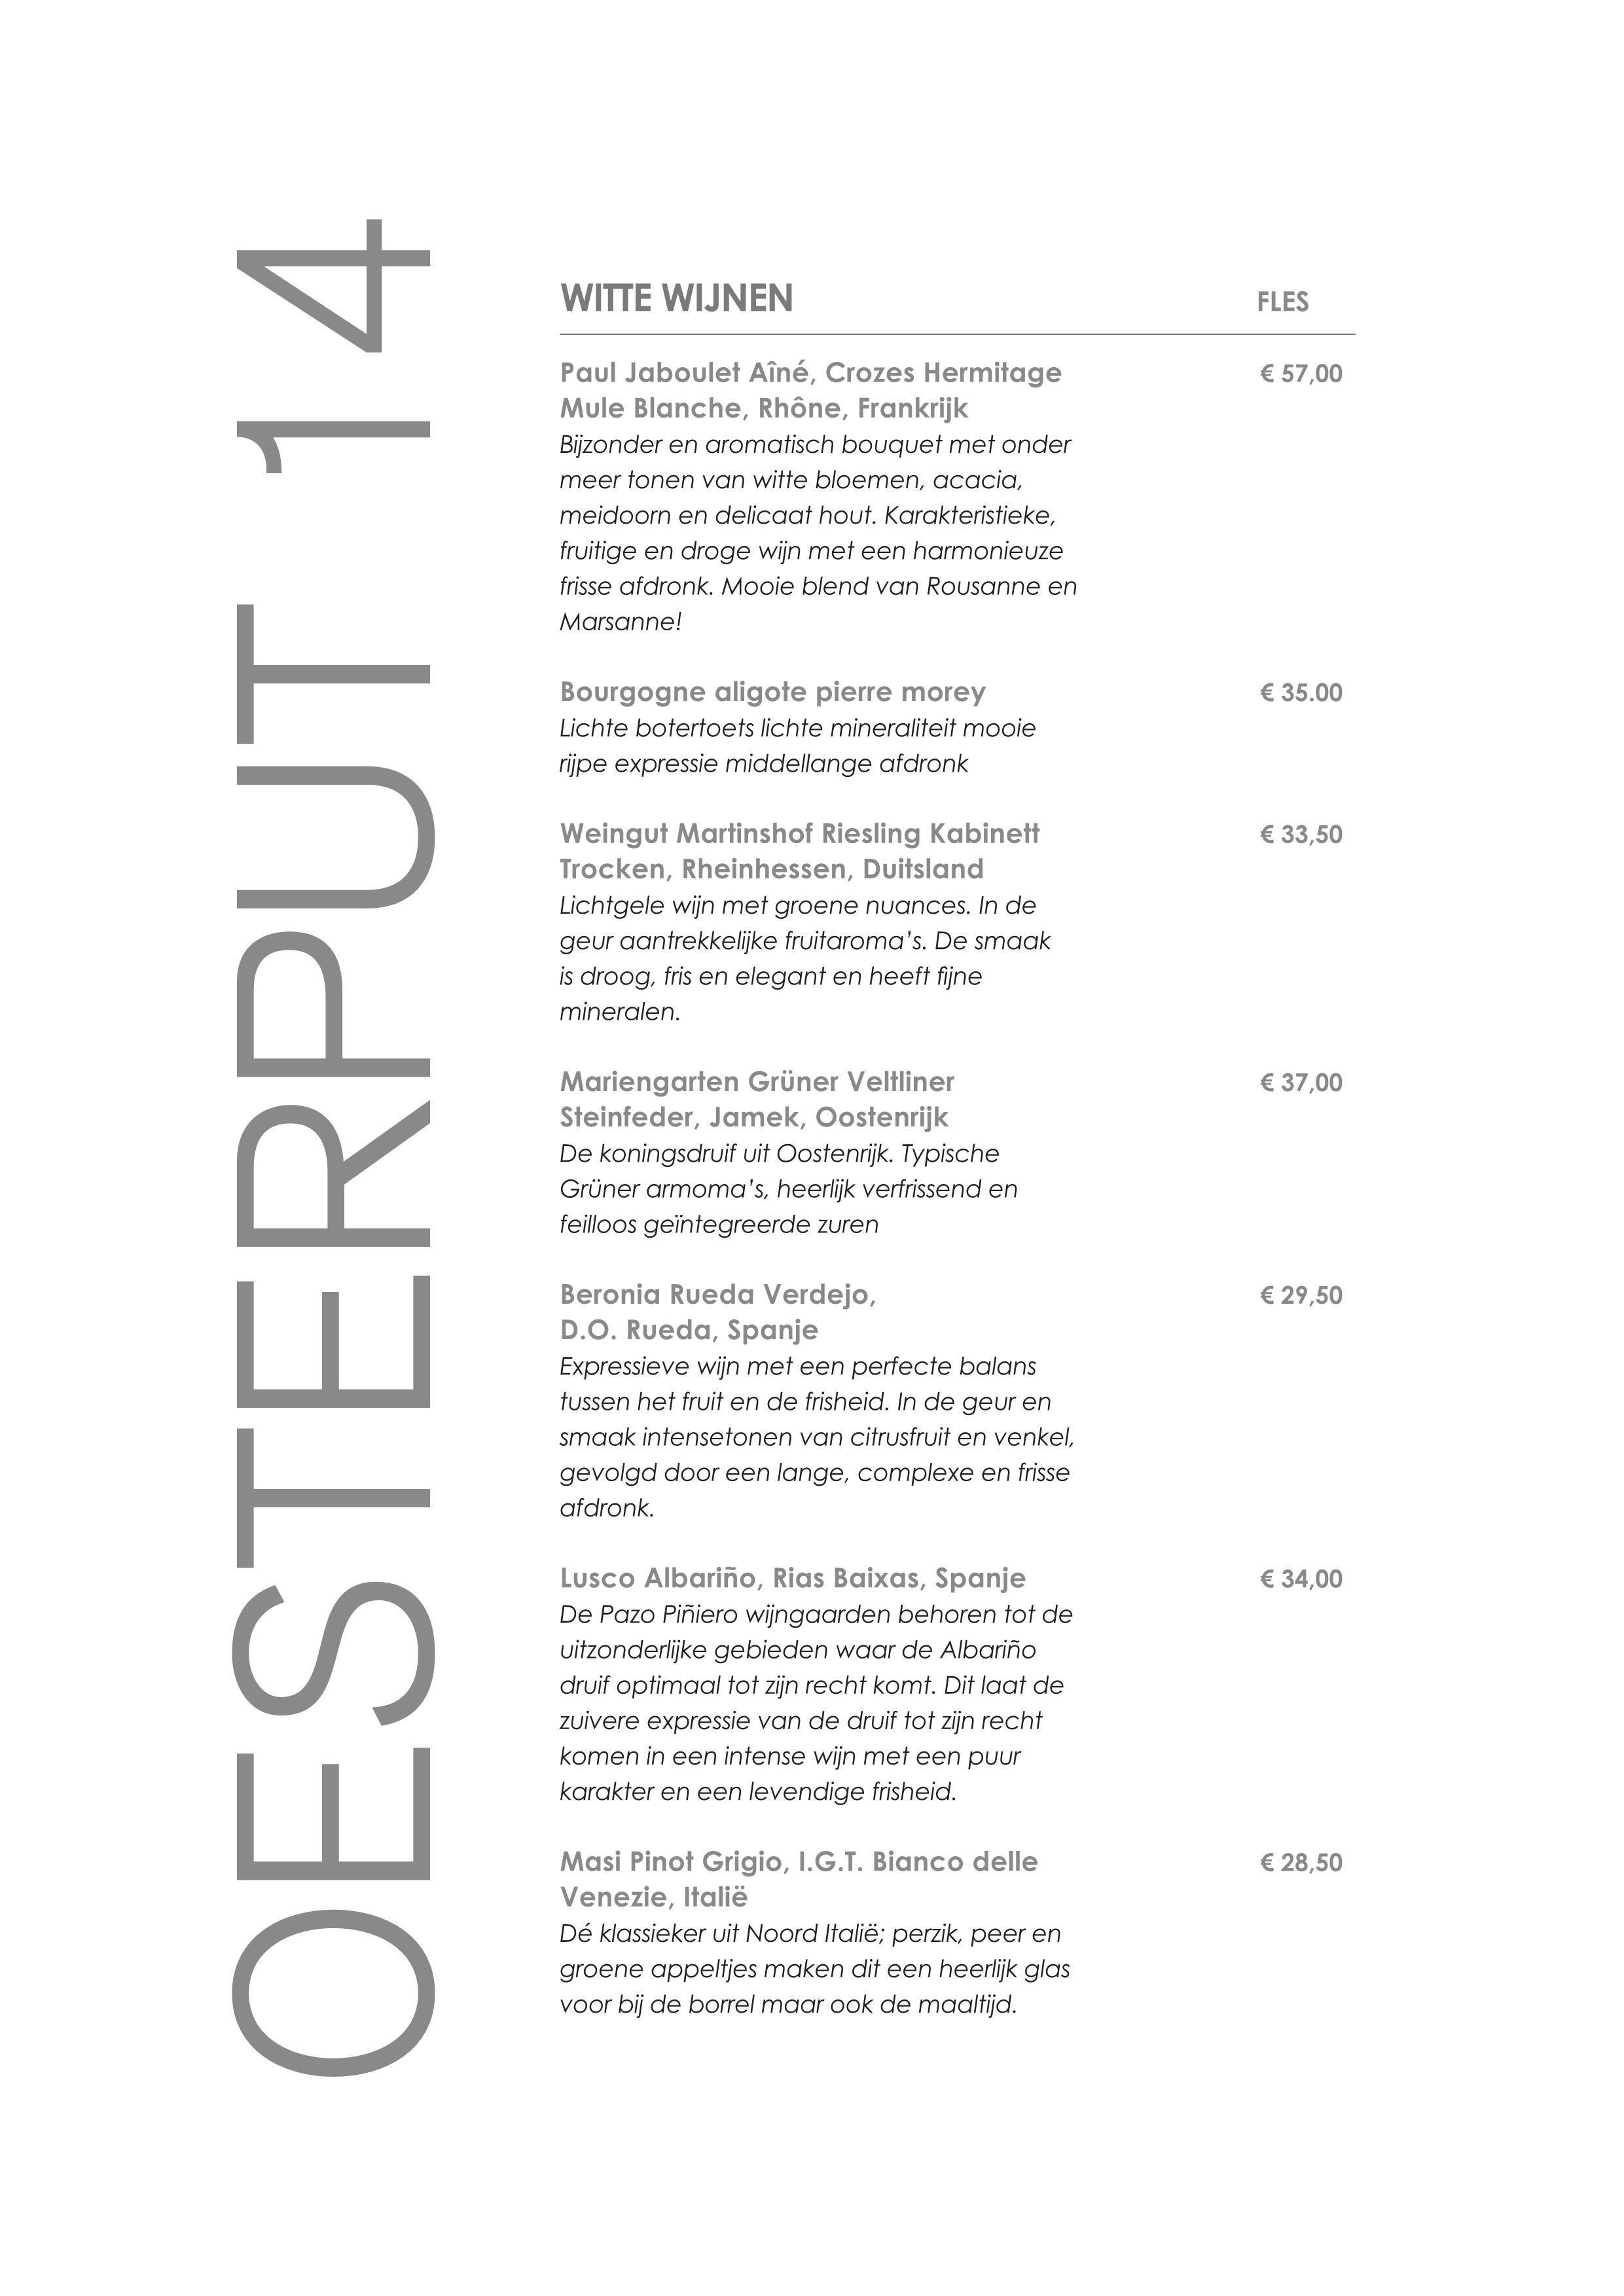 wijnkaart - oesterput14.page4